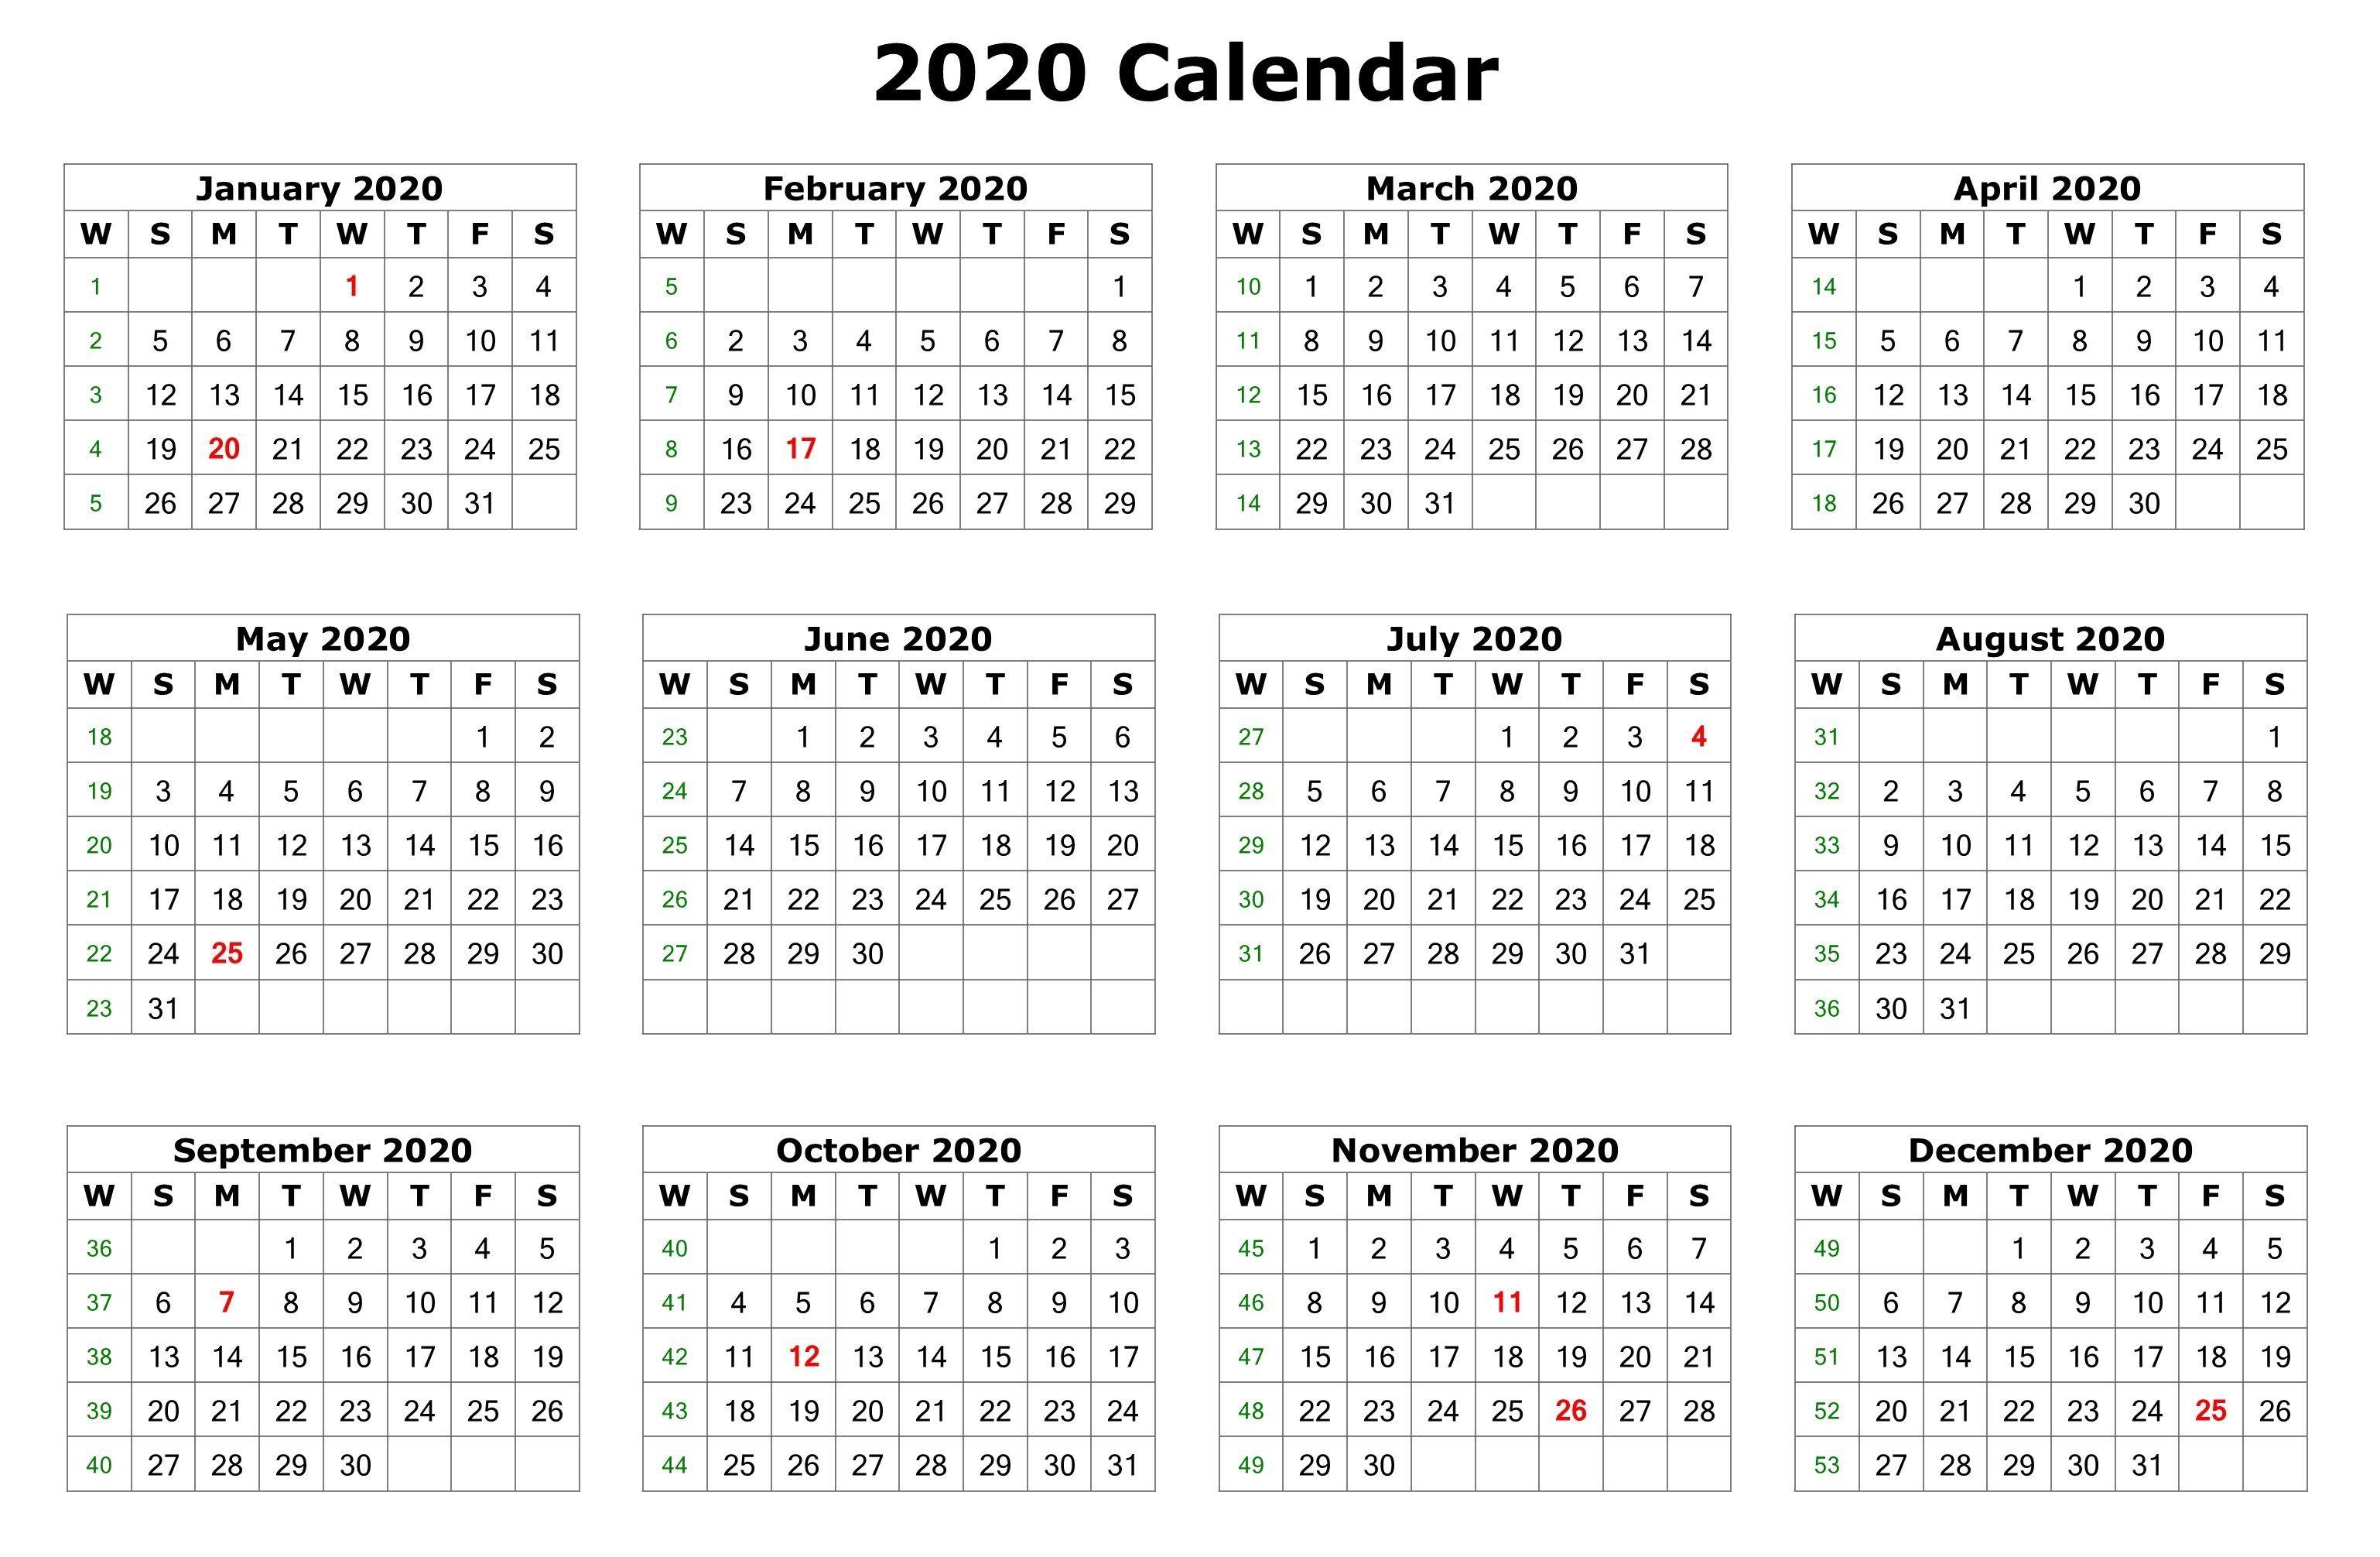 2020 12 Months Calendar Printable | 12 Month Calendar, 2020 with Printable 12 Month 2020 Calendar